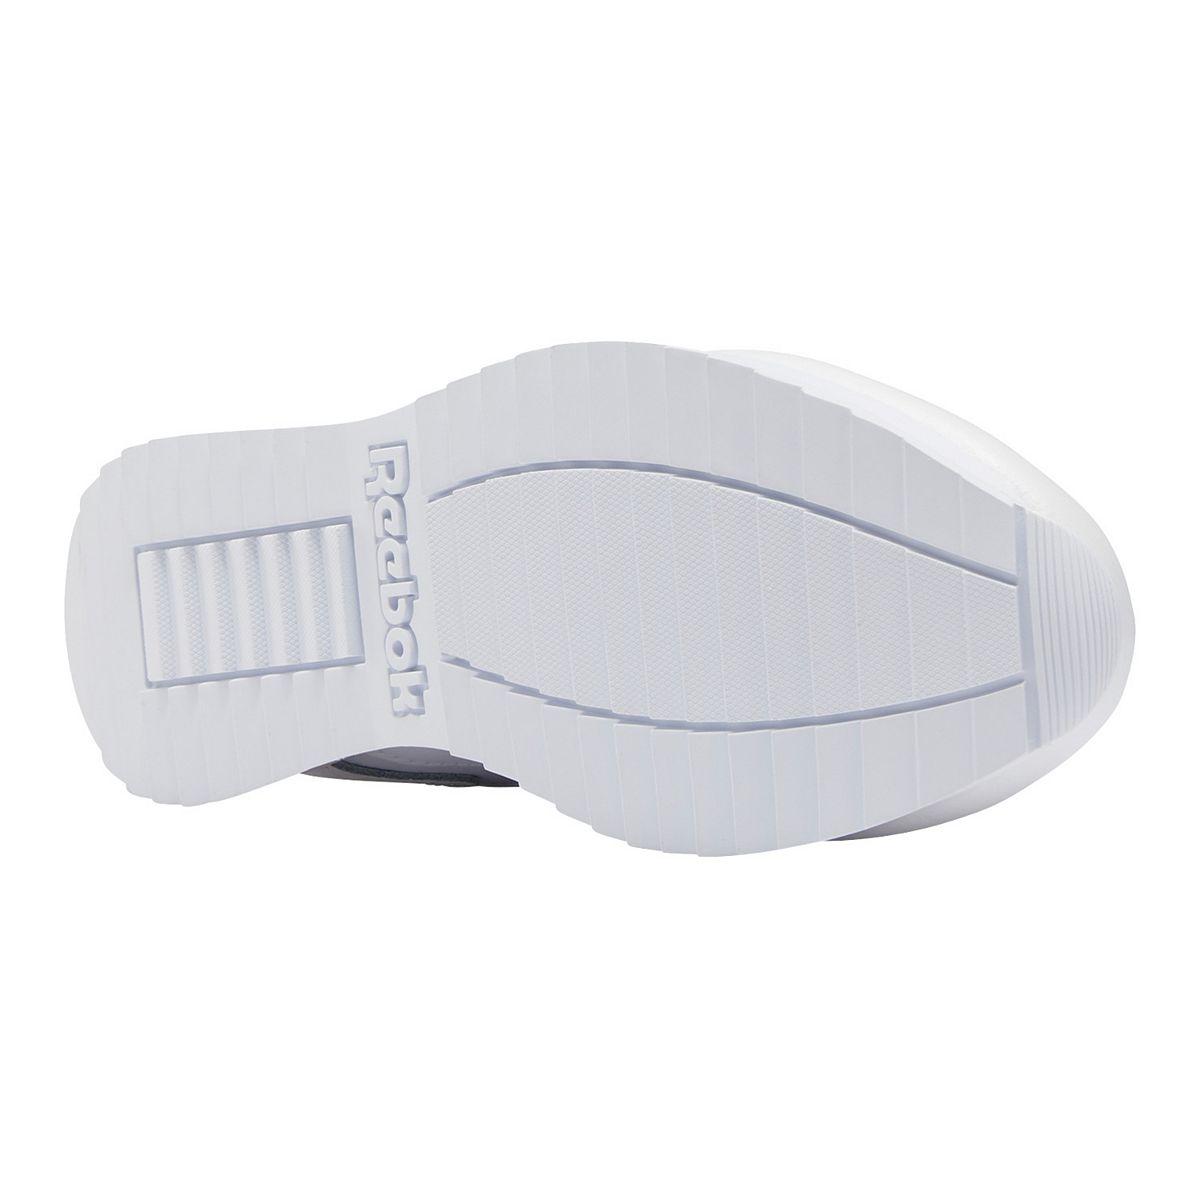 Reebok Classic Harman Ripple Double Women's Platform Sneakers Pixel Pink White WUGlv